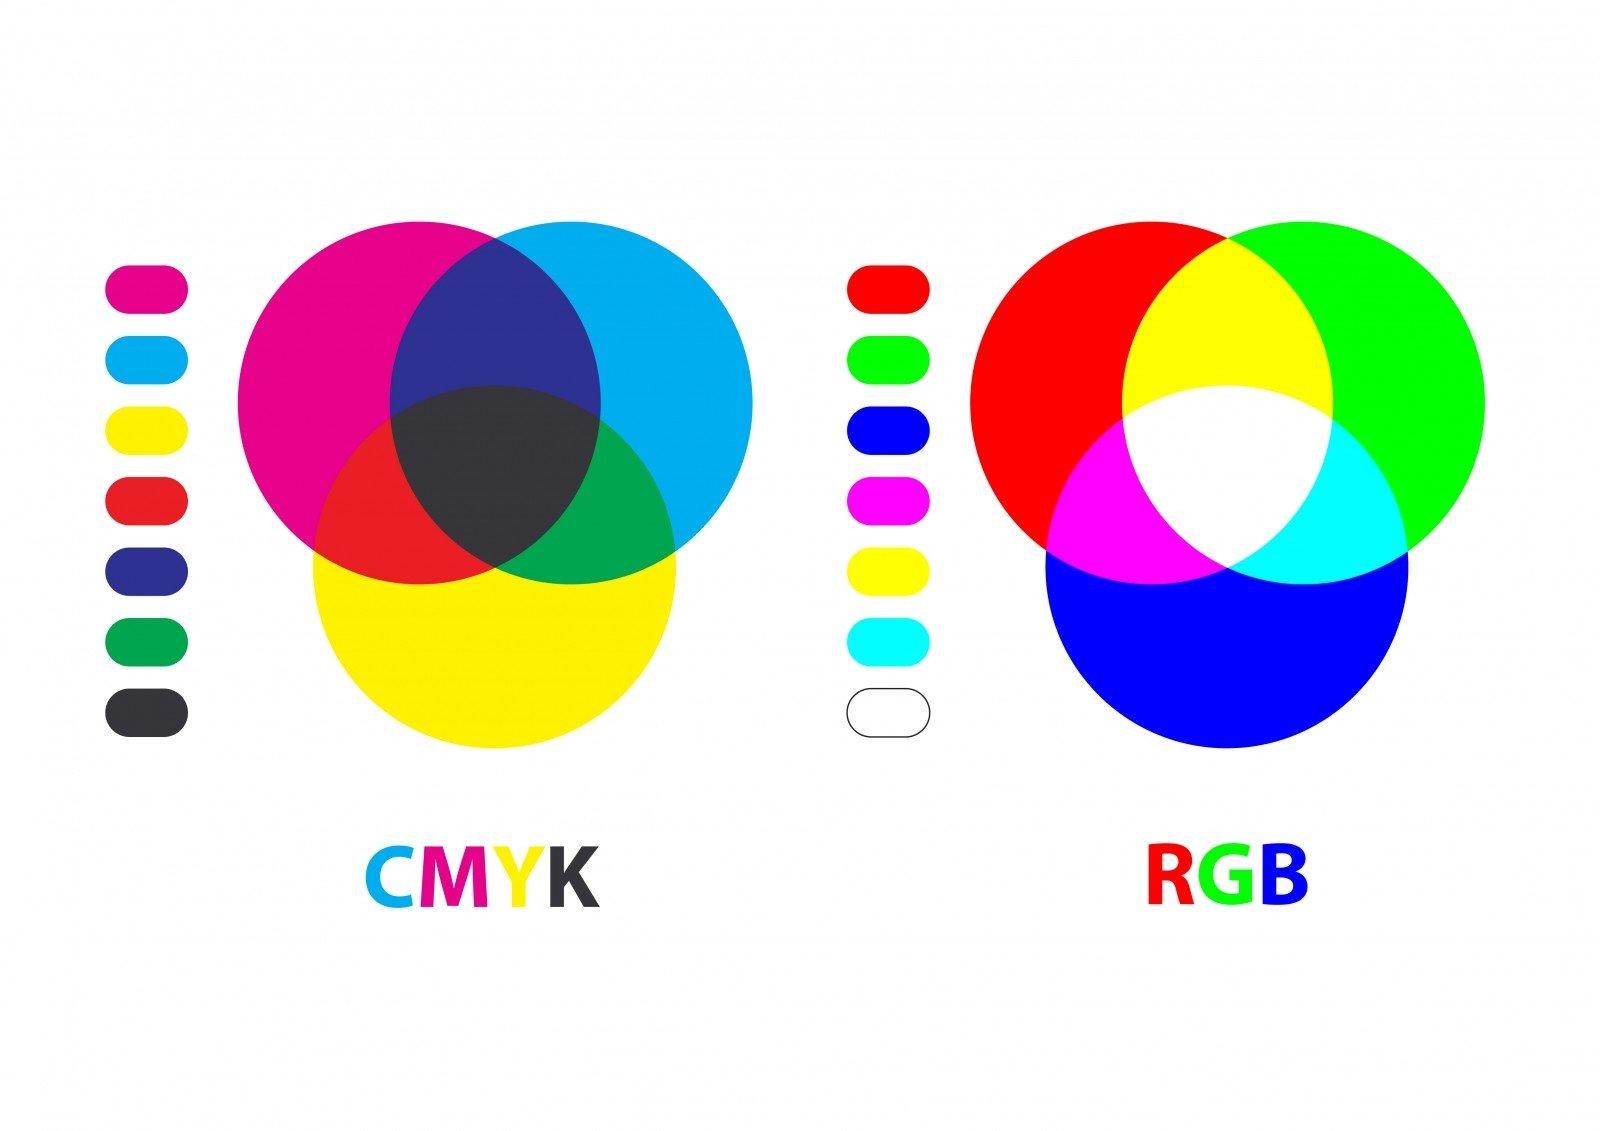 https://g1.dcdn.lt/images/pix/rgb-ir-cmyk-skirtumai-71643892.jpg